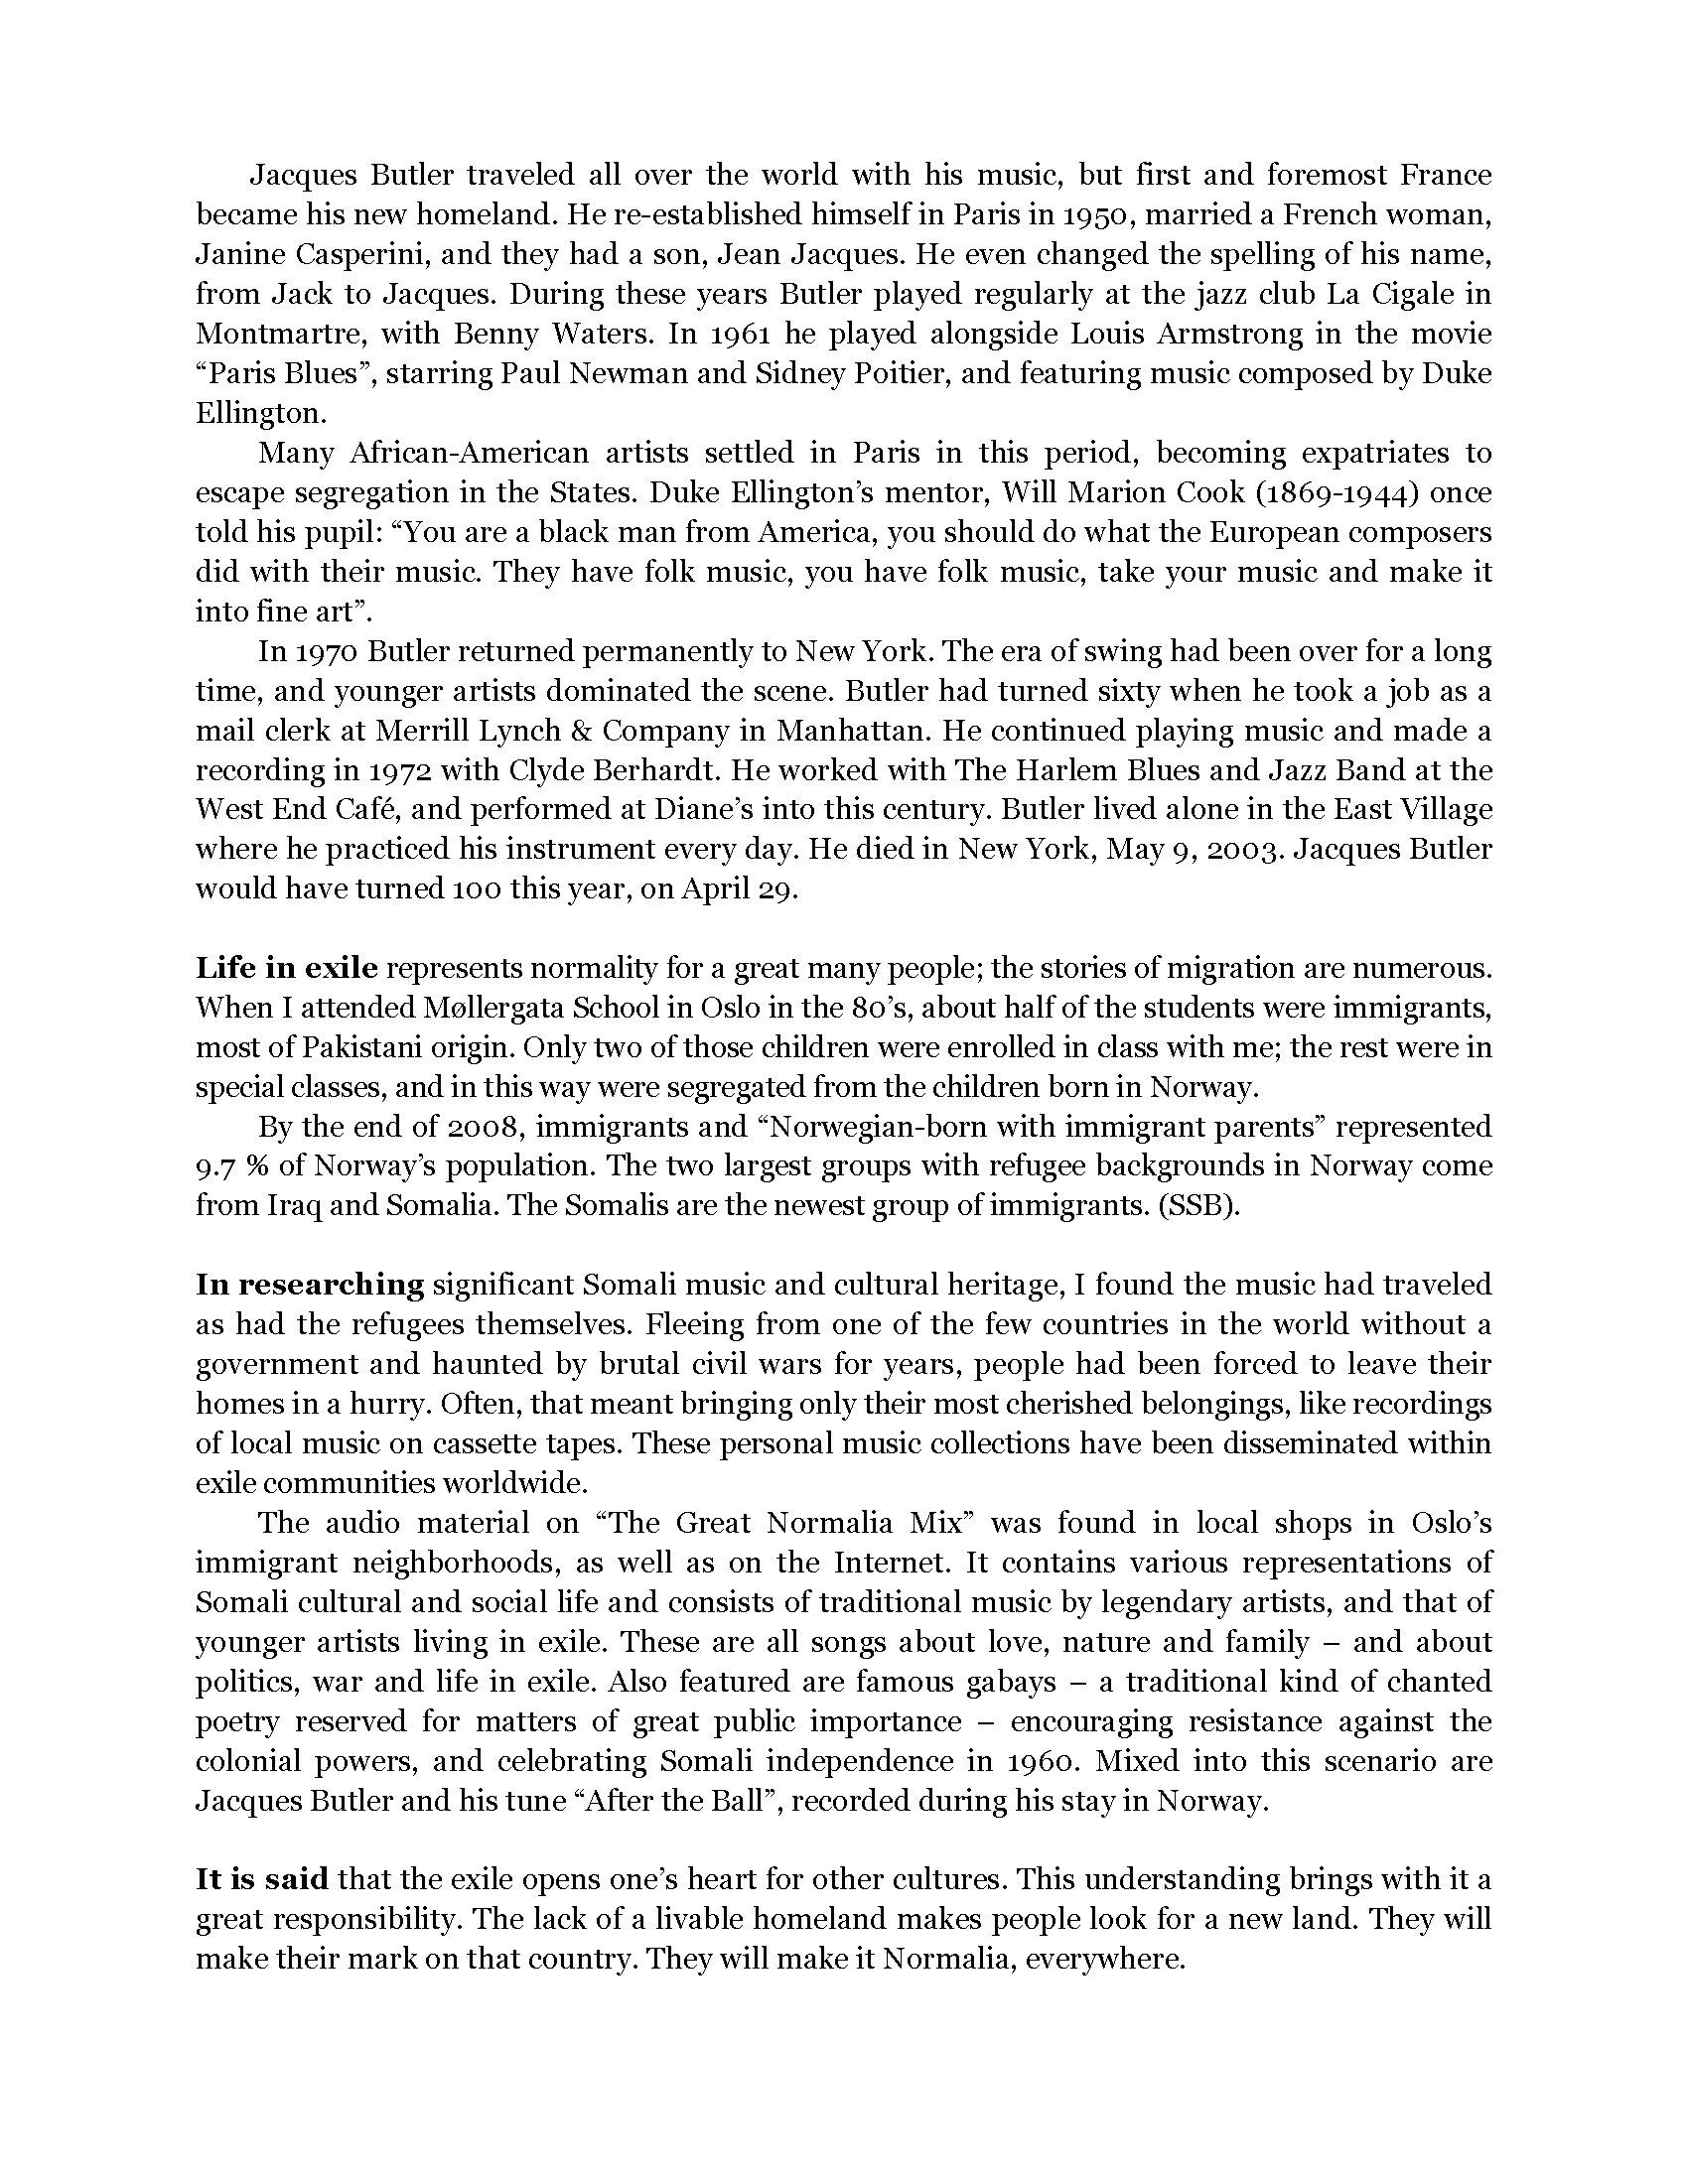 Lange-Boktekst _Normalia featuring Jacques Butler_Page_2.jpg